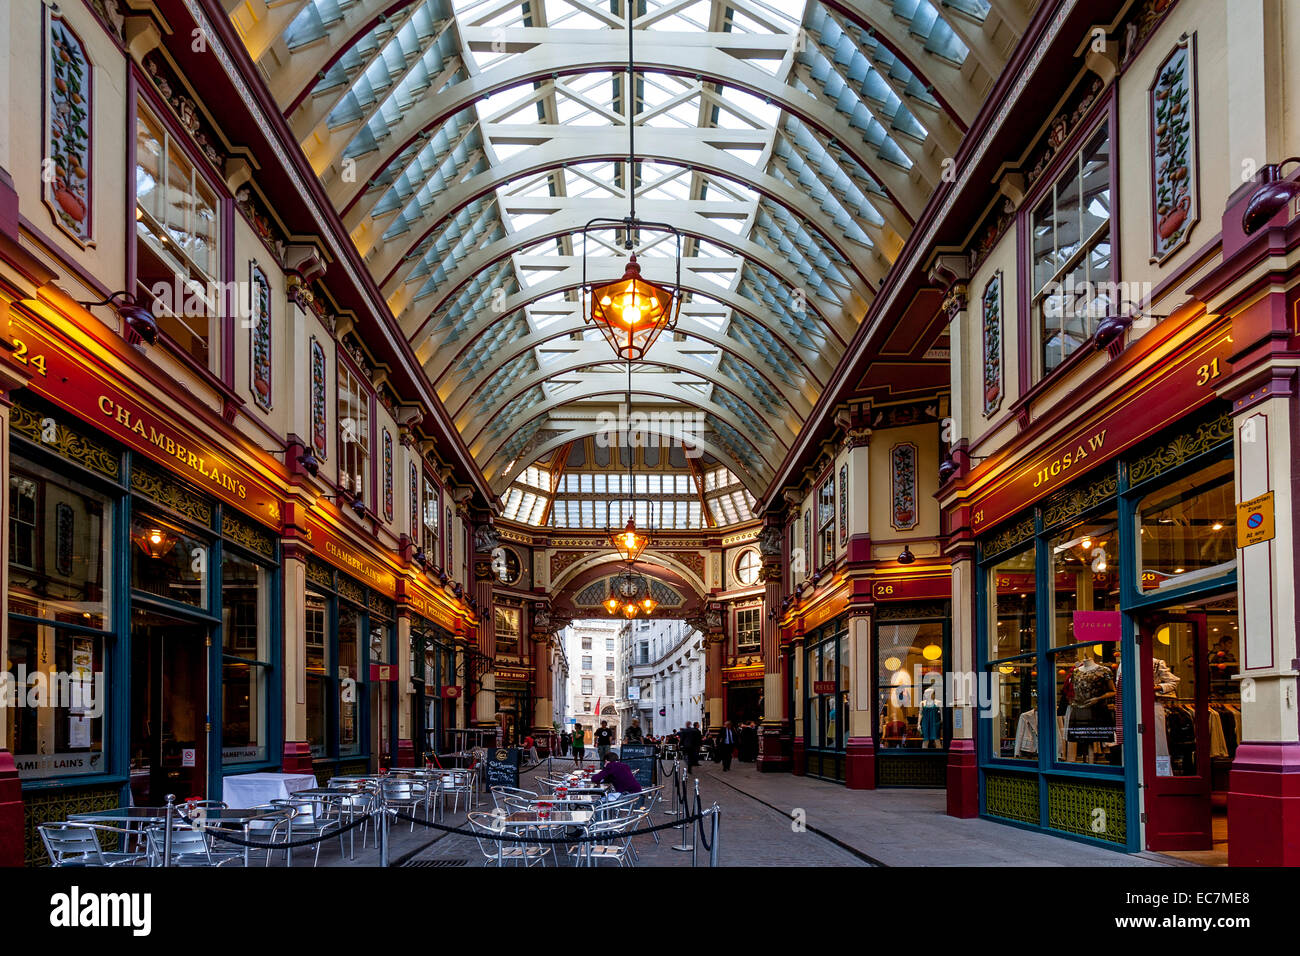 Leadenhall Market Interieur, London, England Stockbild